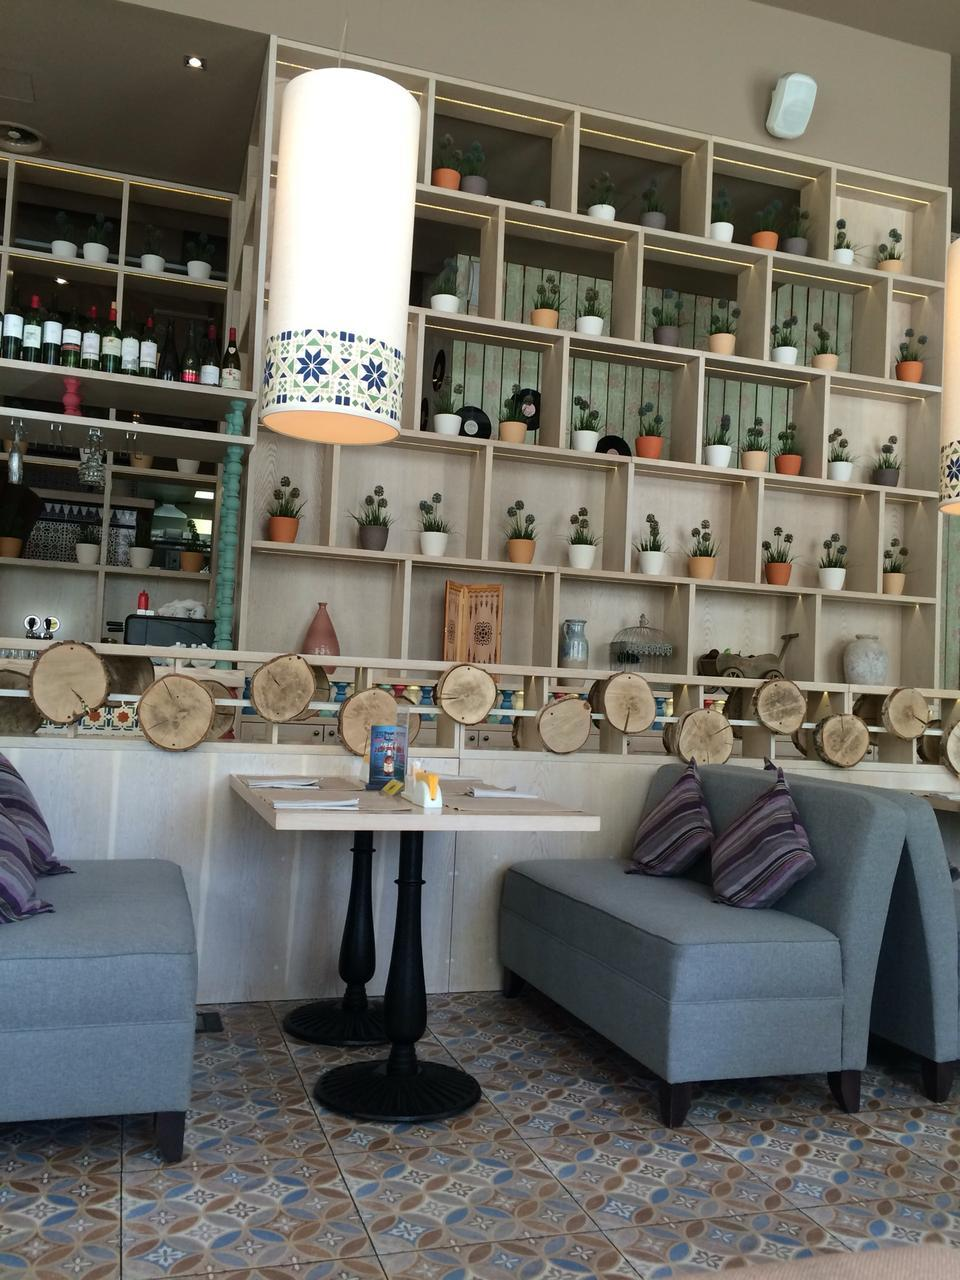 Восточное Кафе Лепешка в Королеве фото 2